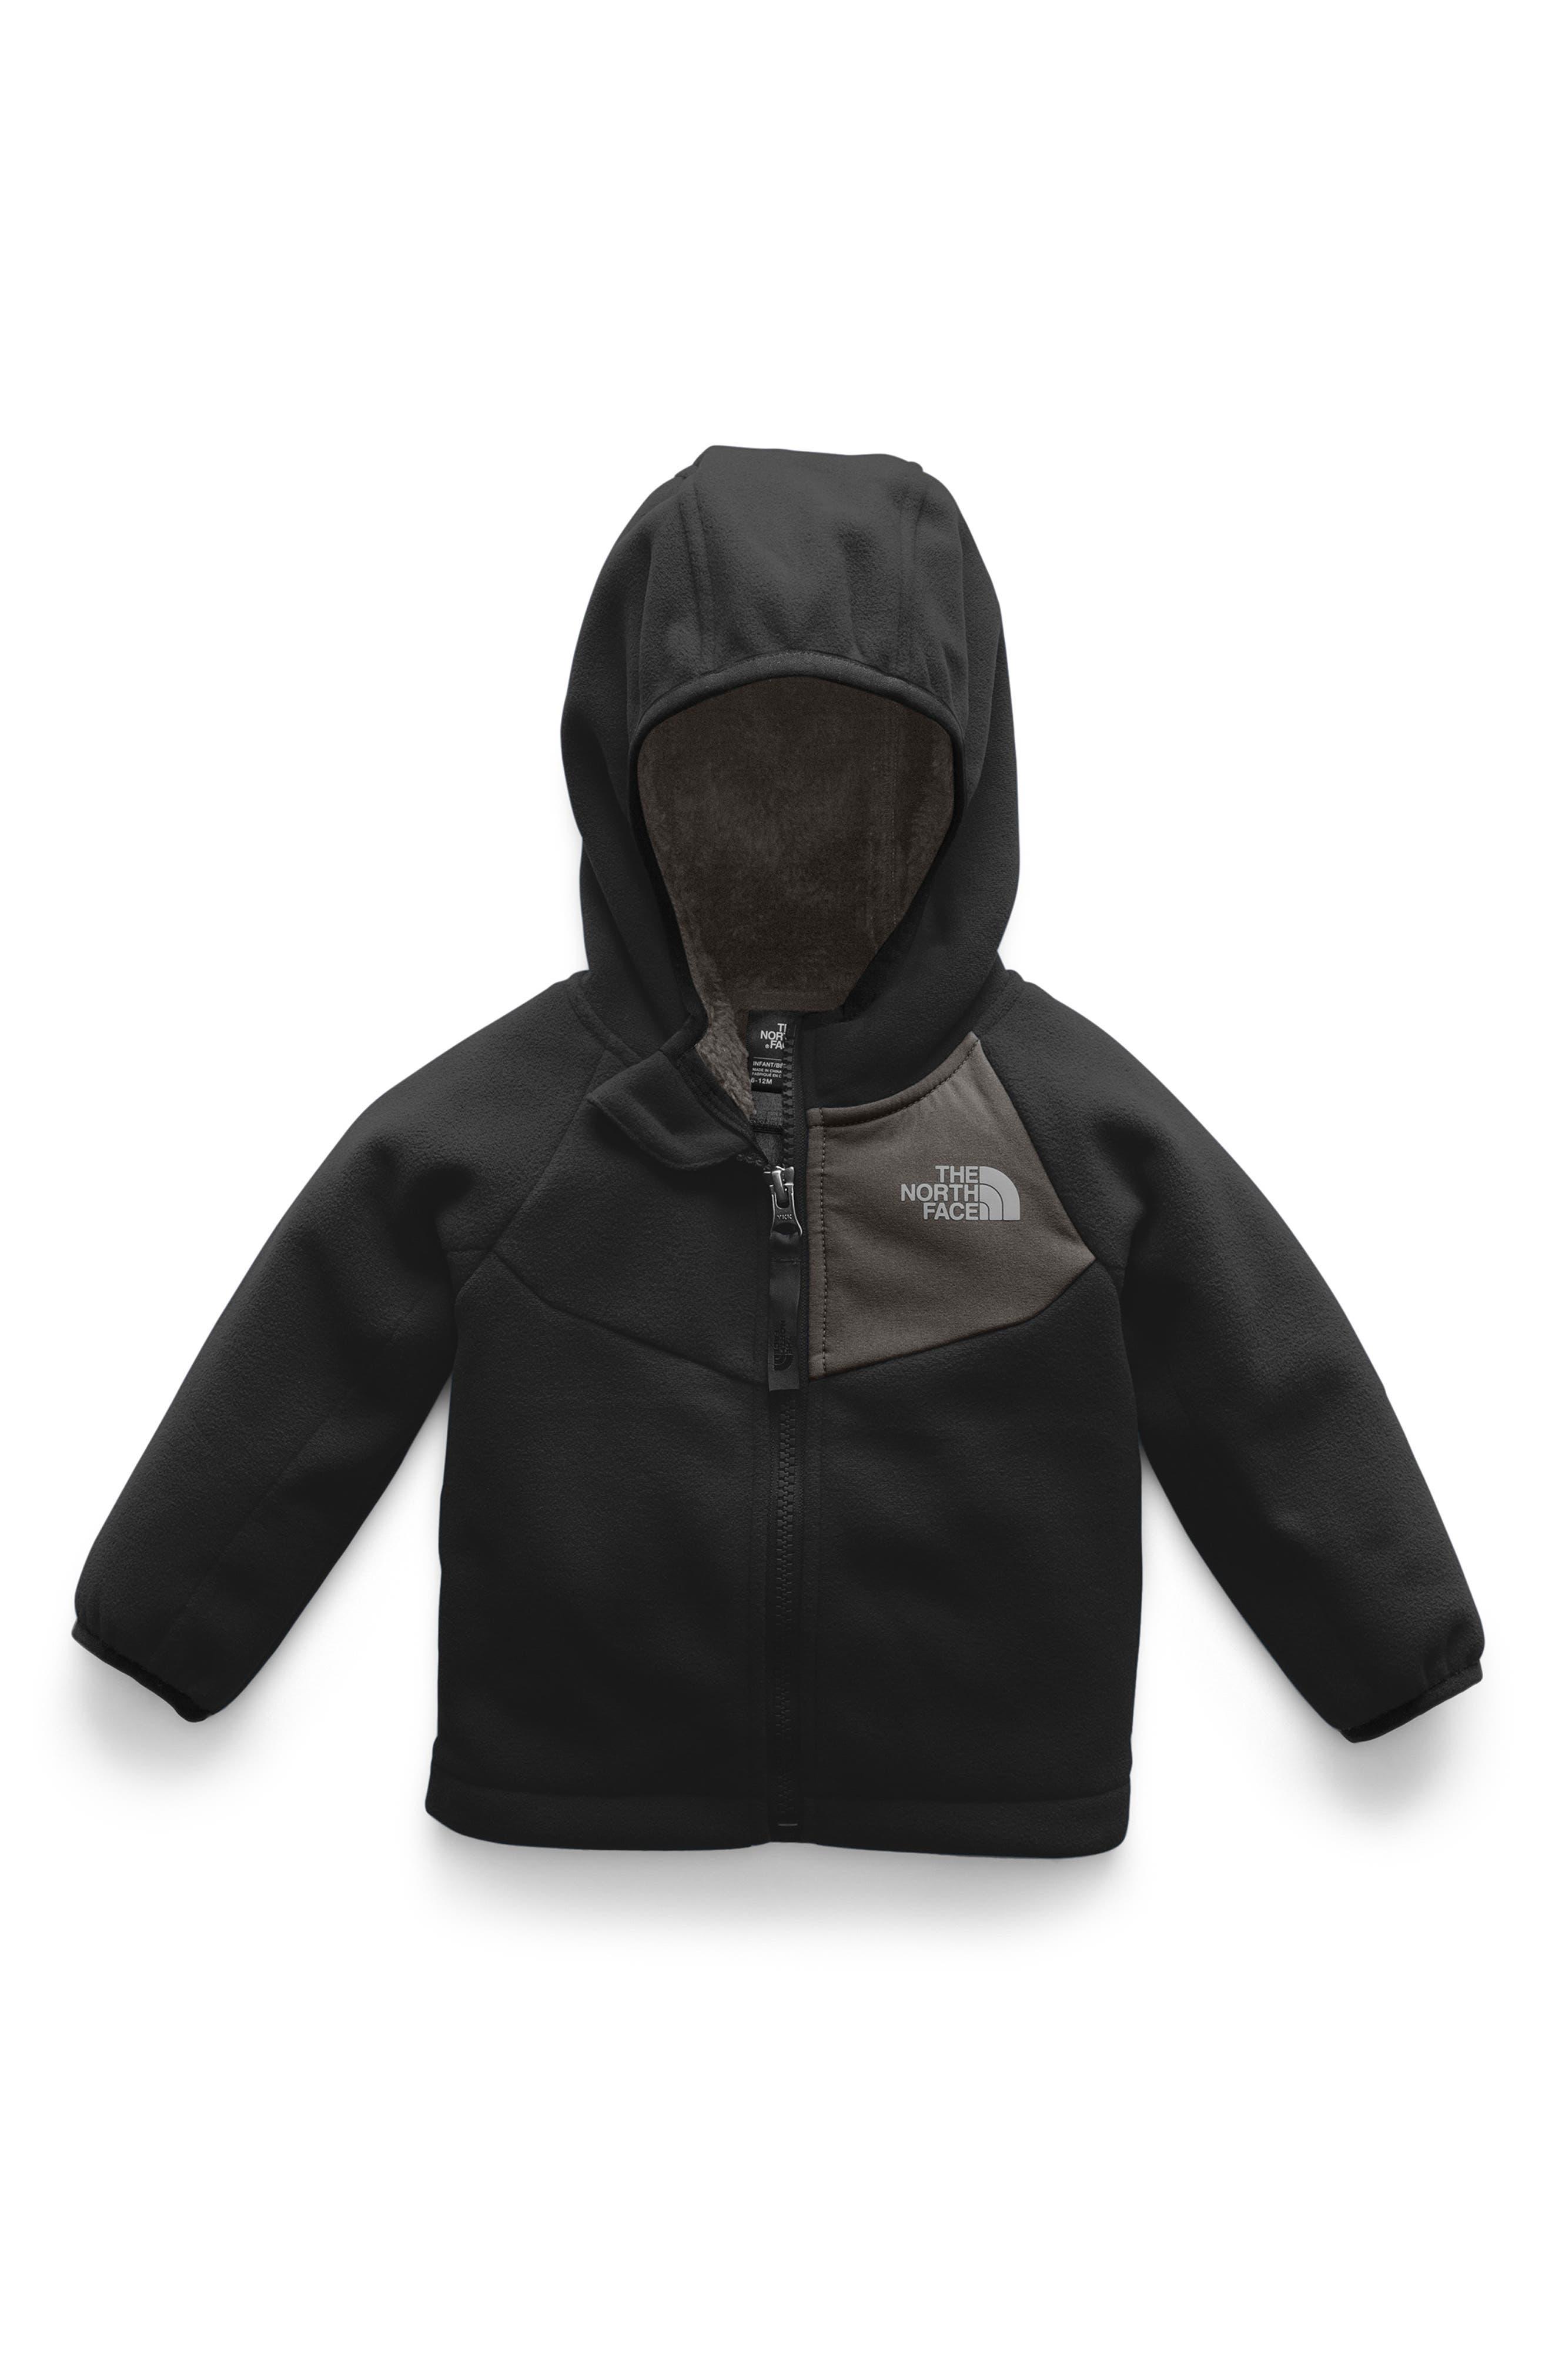 Chimborazo Hooded Jacket,                         Main,                         color, TNF BLACK/ GRAPHITE GREY